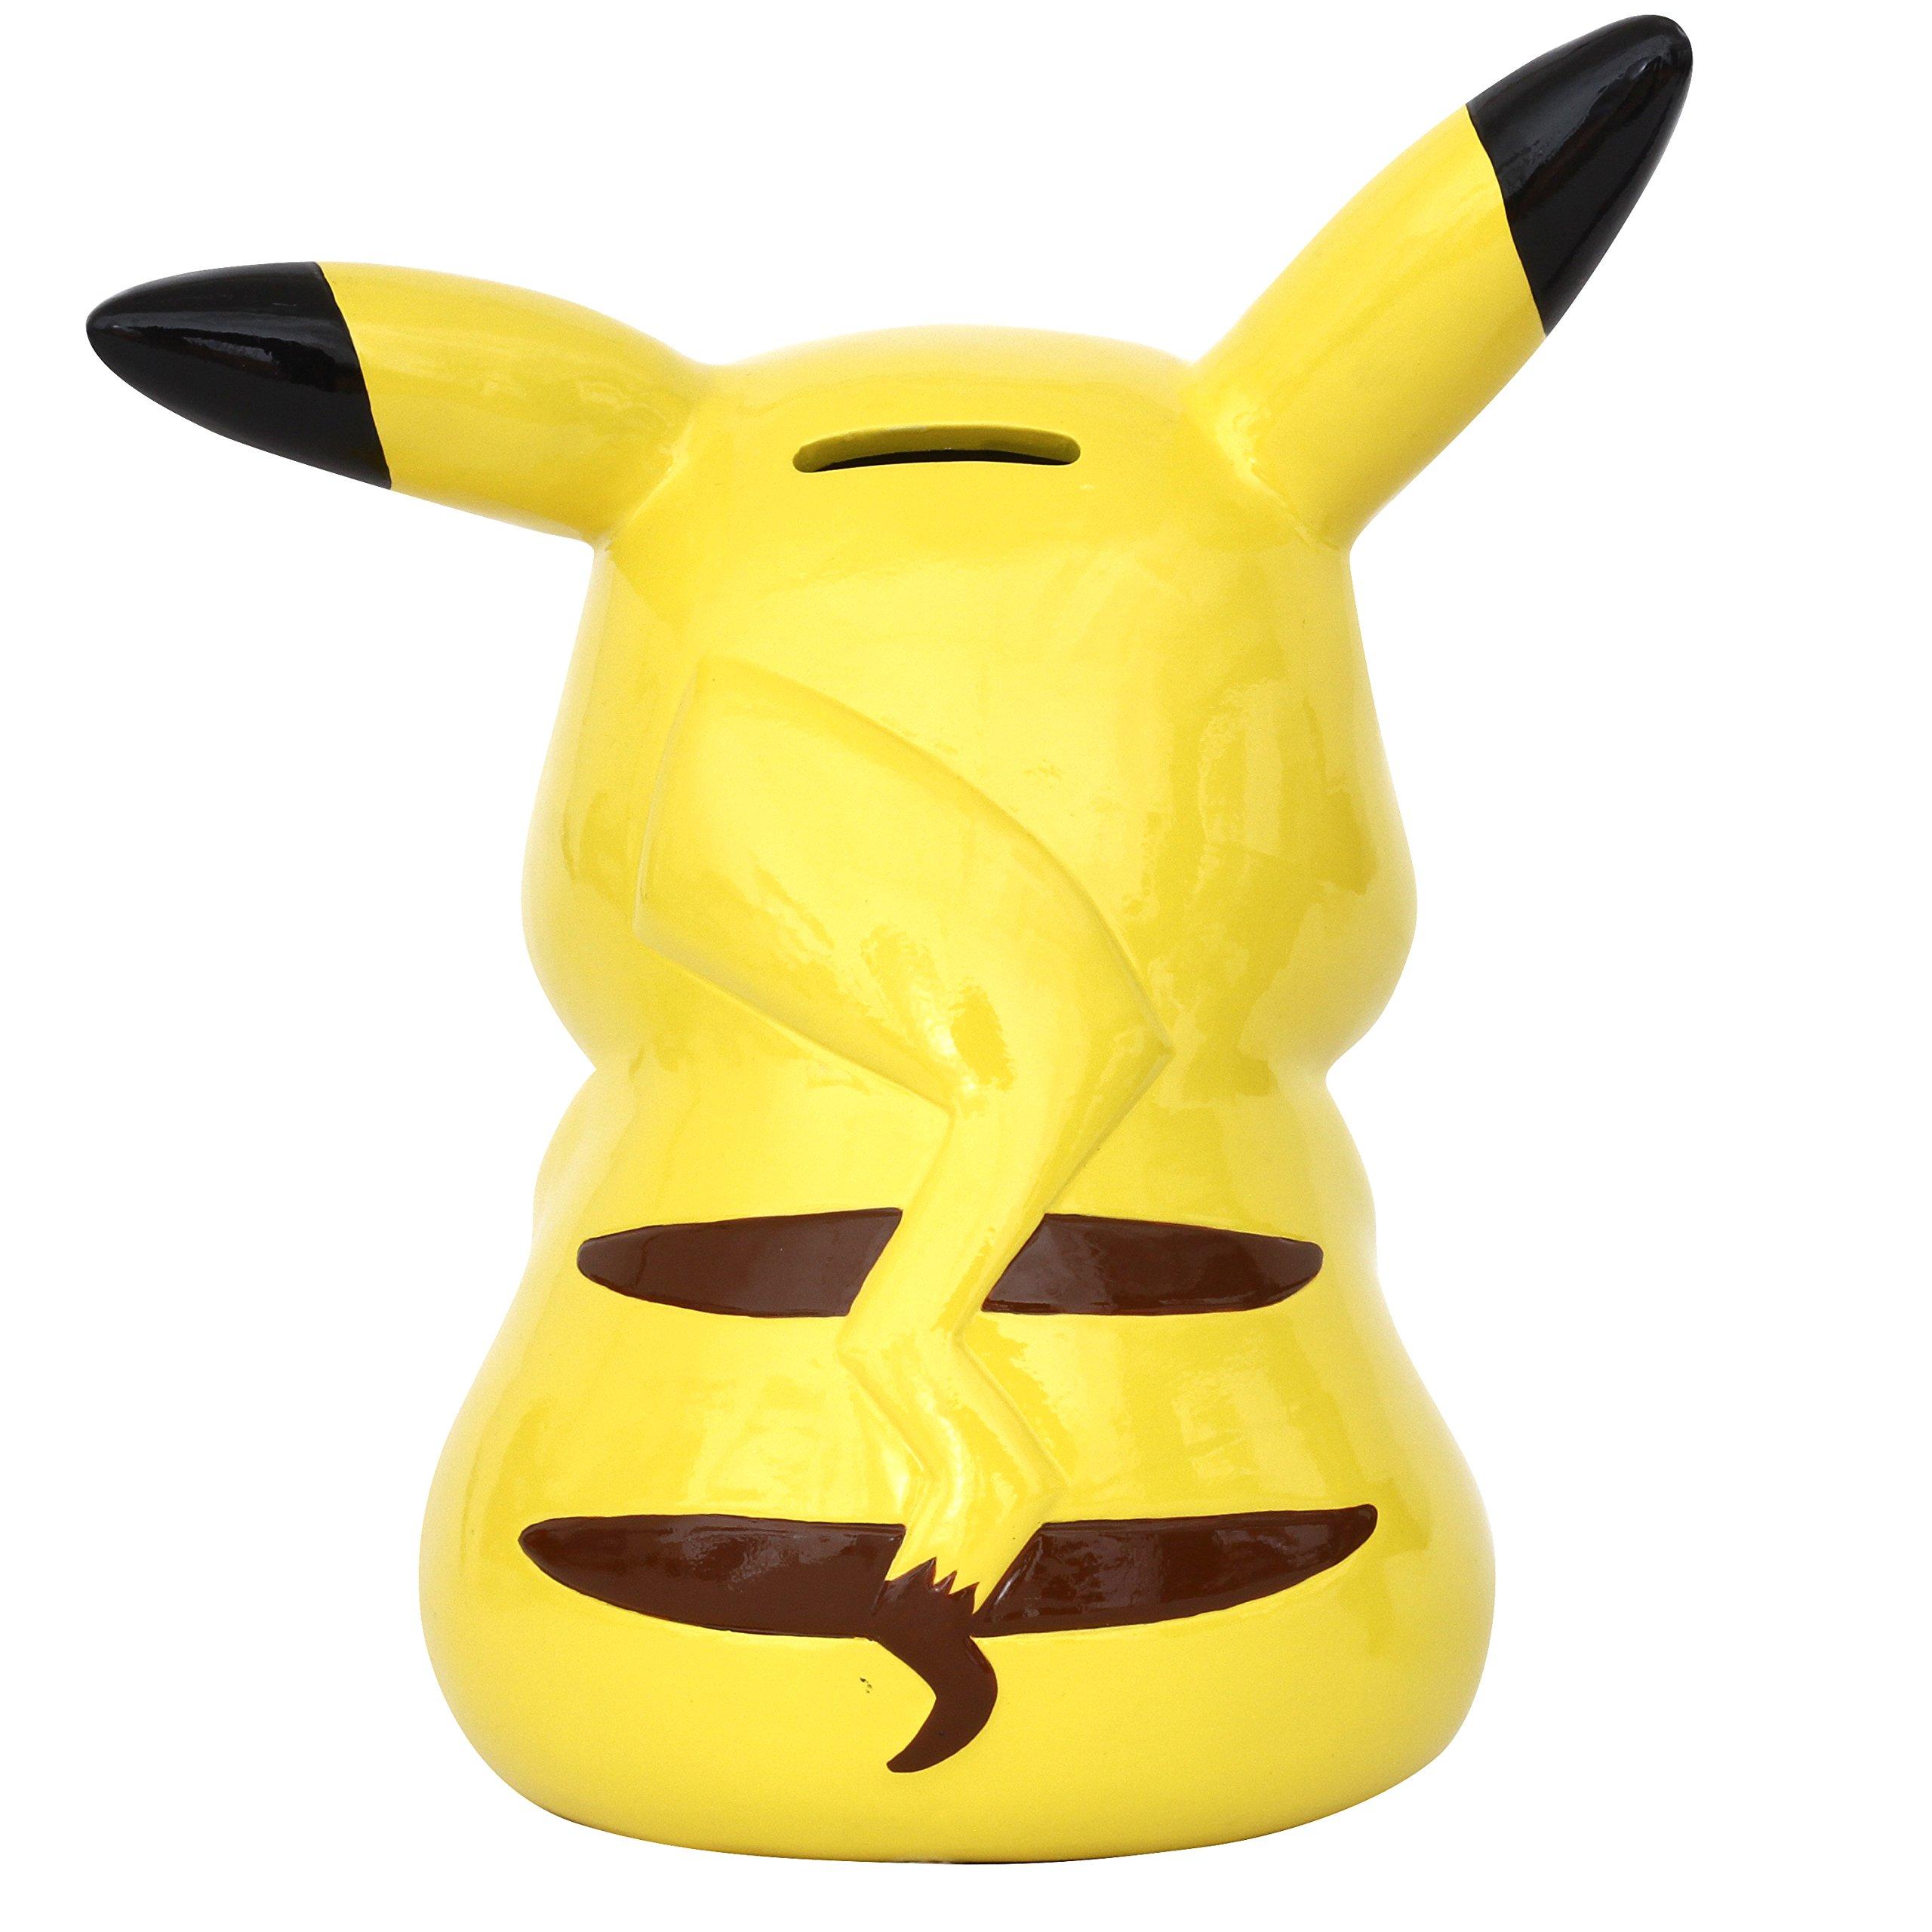 Fab Star Kid's Pikachu Bank, Yellow by Pokémon (Image #2)